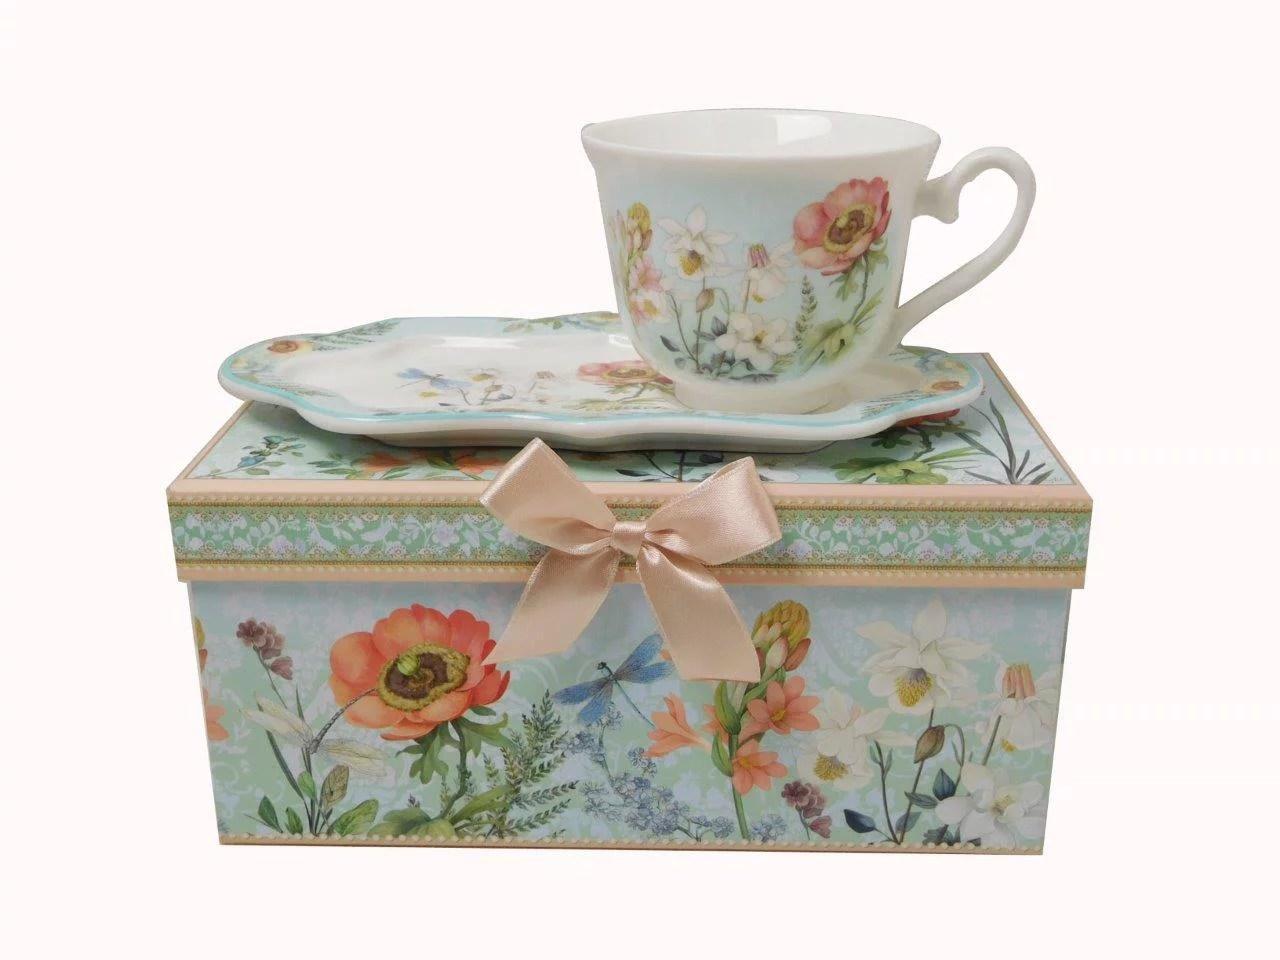 Lightahead New Bone China Unique 8 5oz Tea Coffee Cup